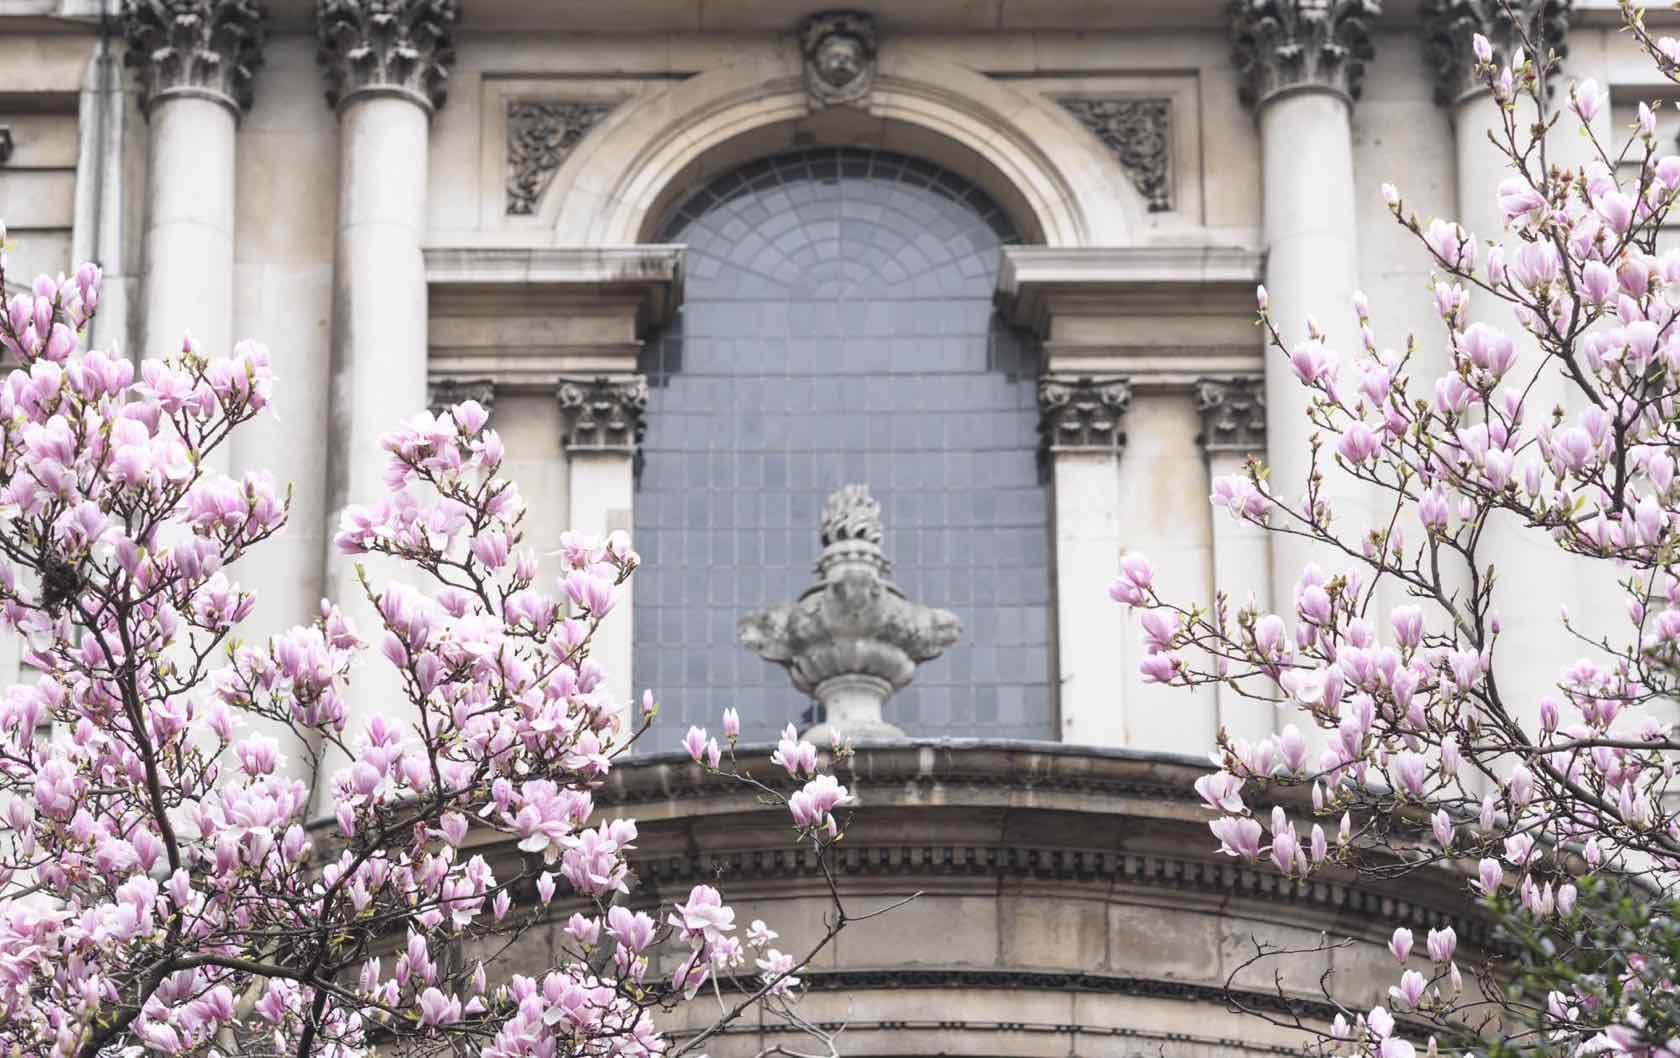 London in springtime flowers